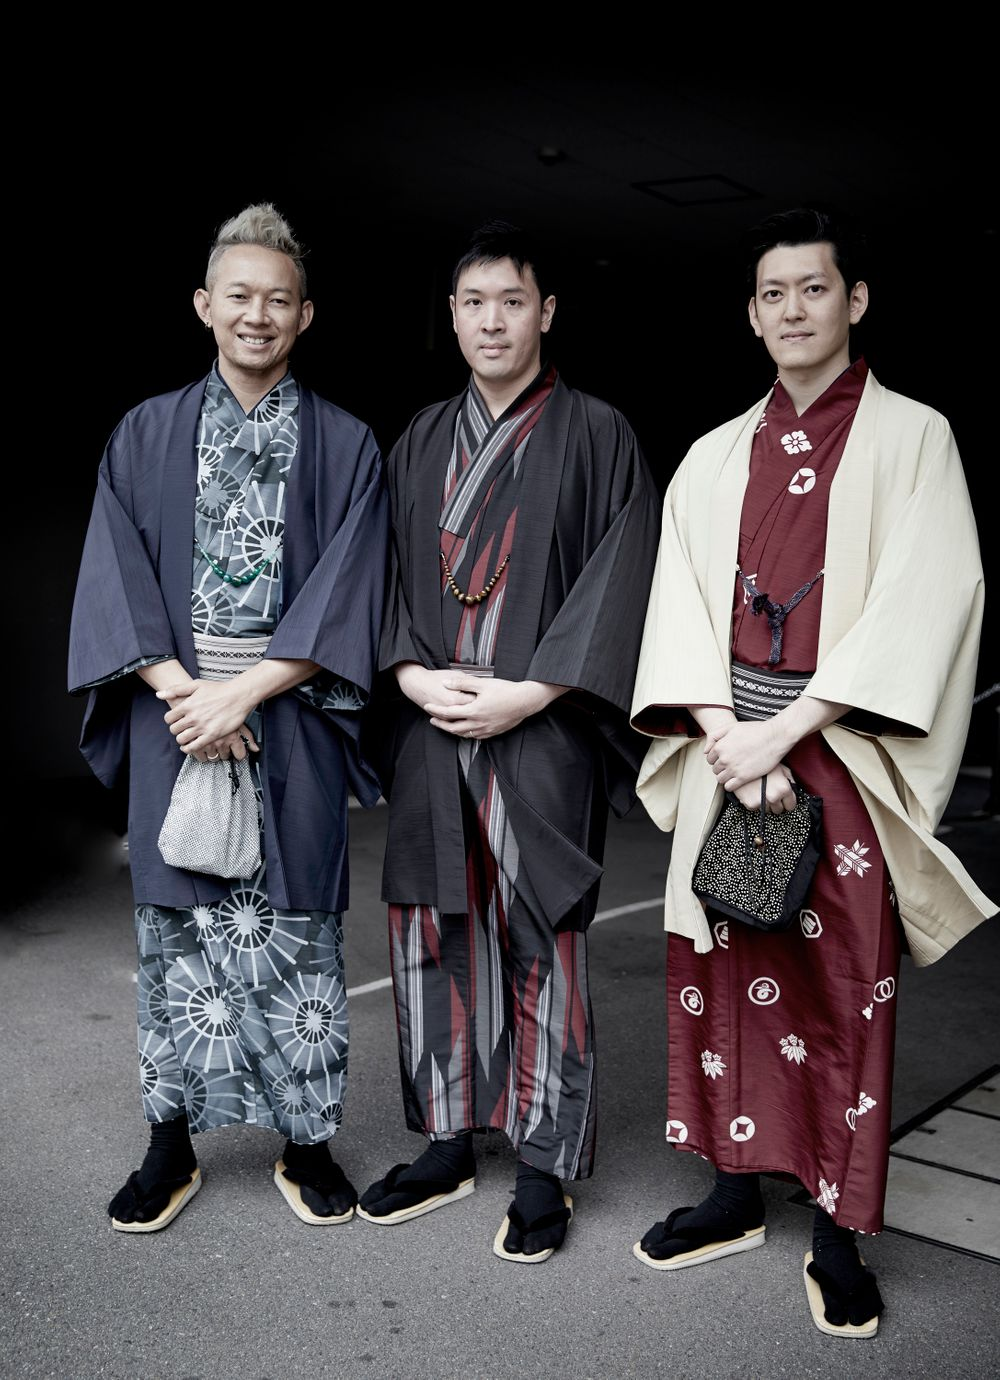 180401_NM_Japan_1808_RT2.JPG